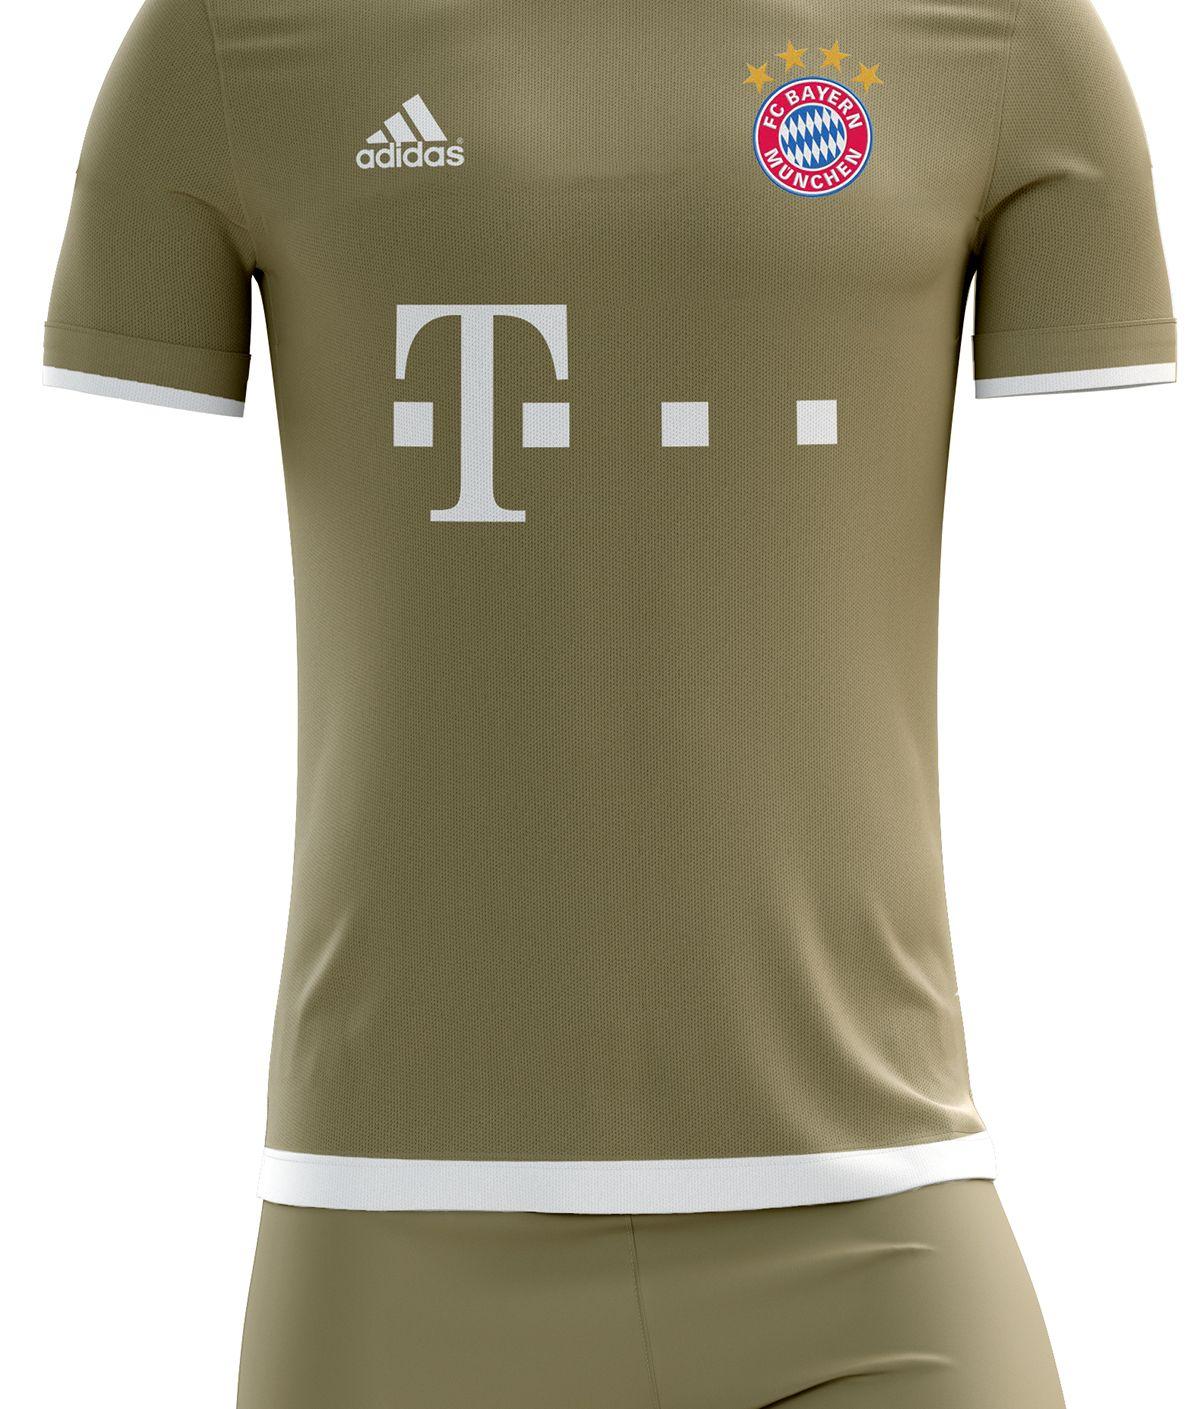 c071b816d4f Fc Bayern Munchen Football Kit 16 17. on Behance